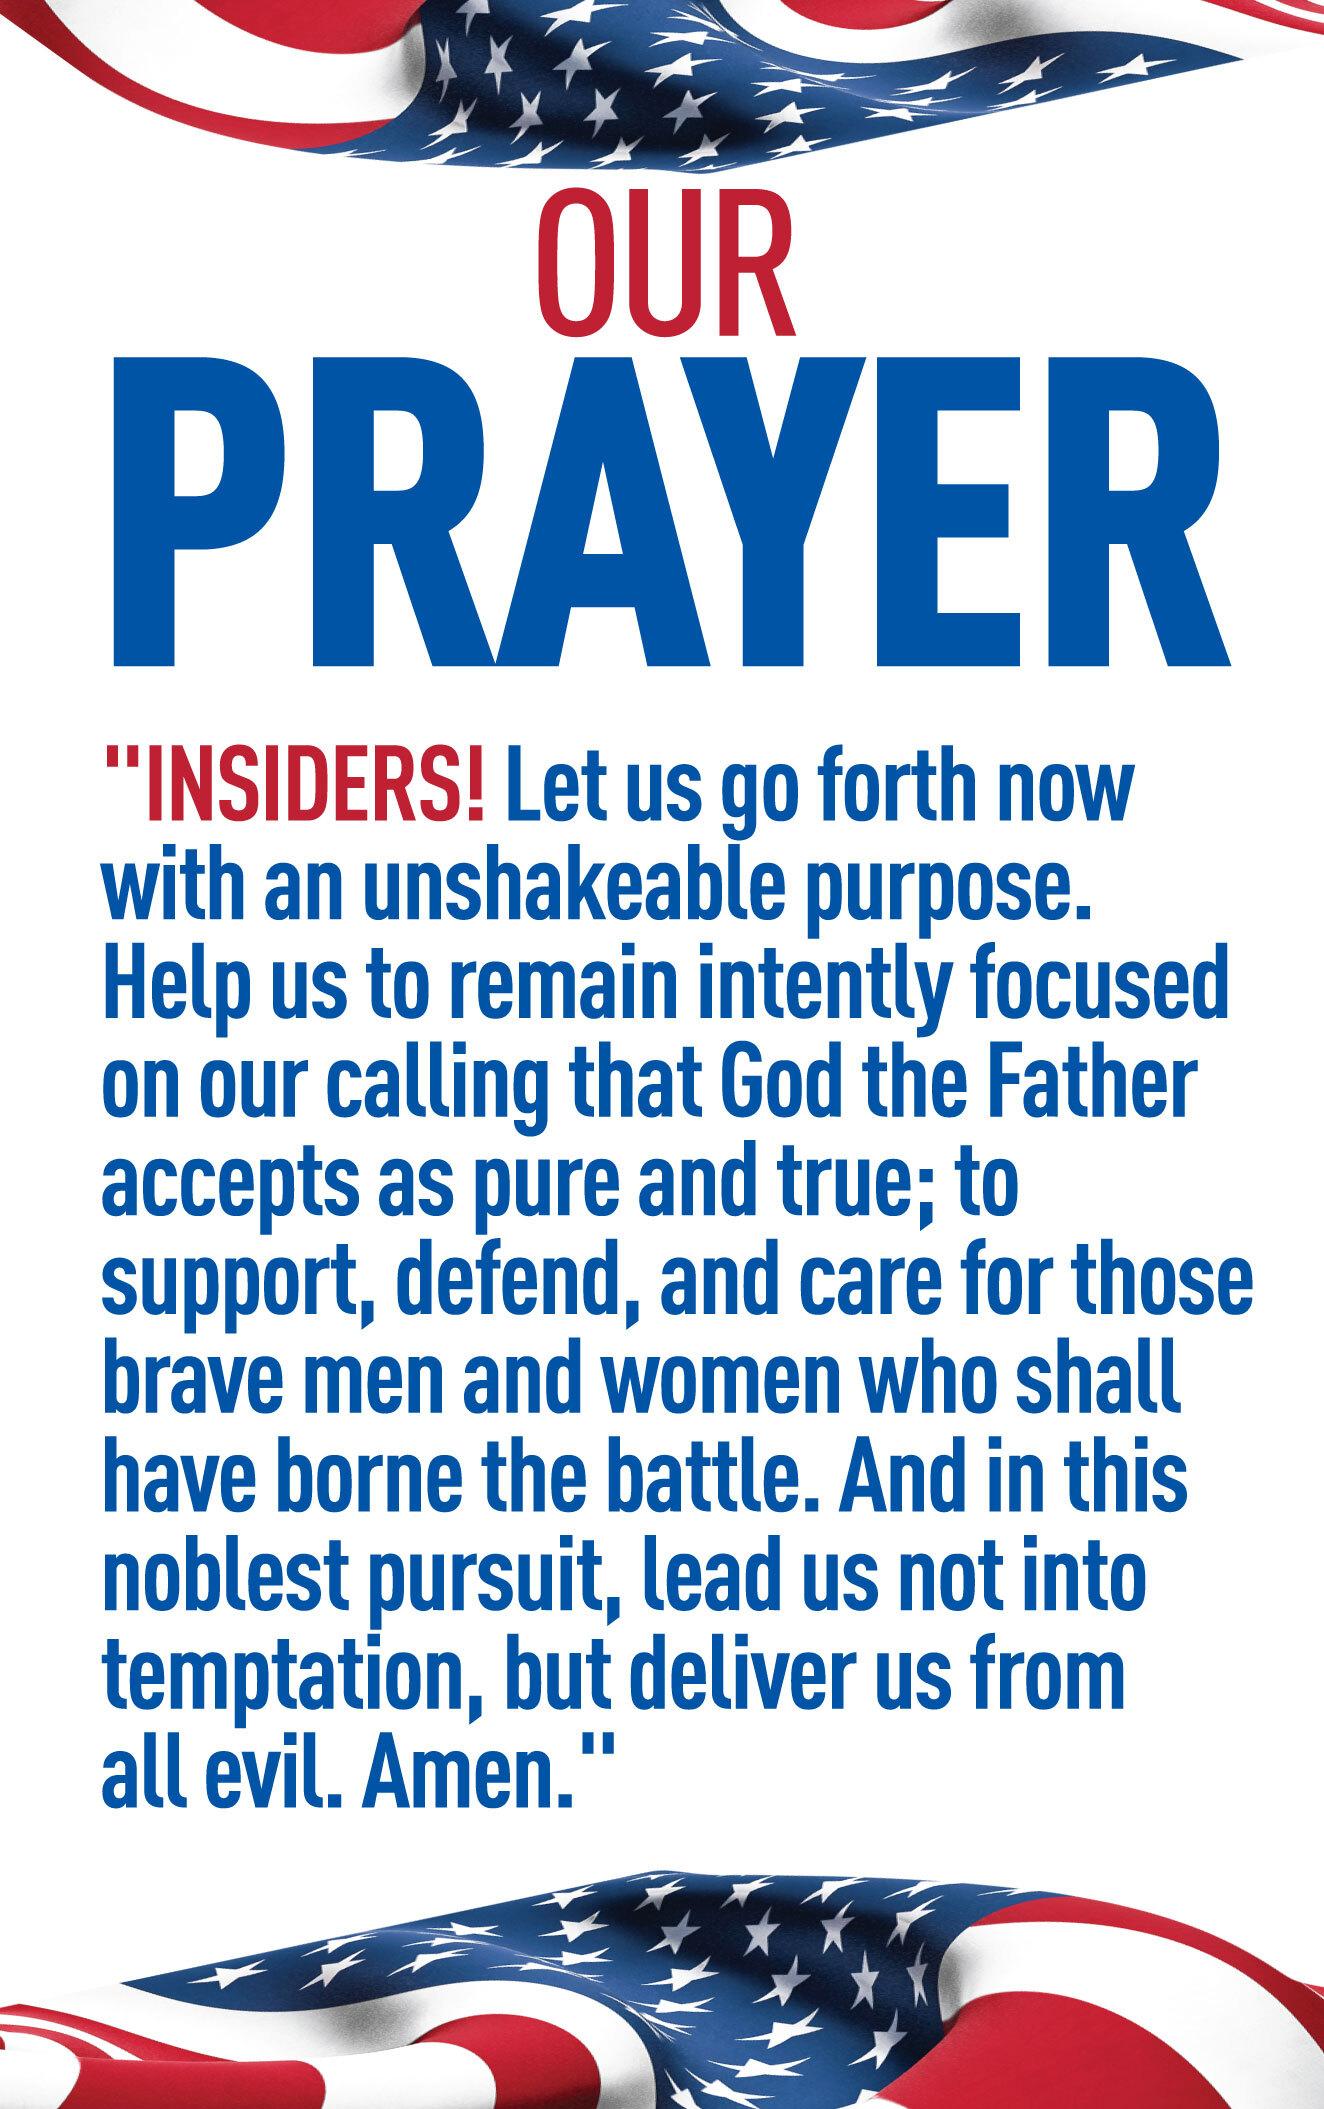 About VA Claims Insider Prayer